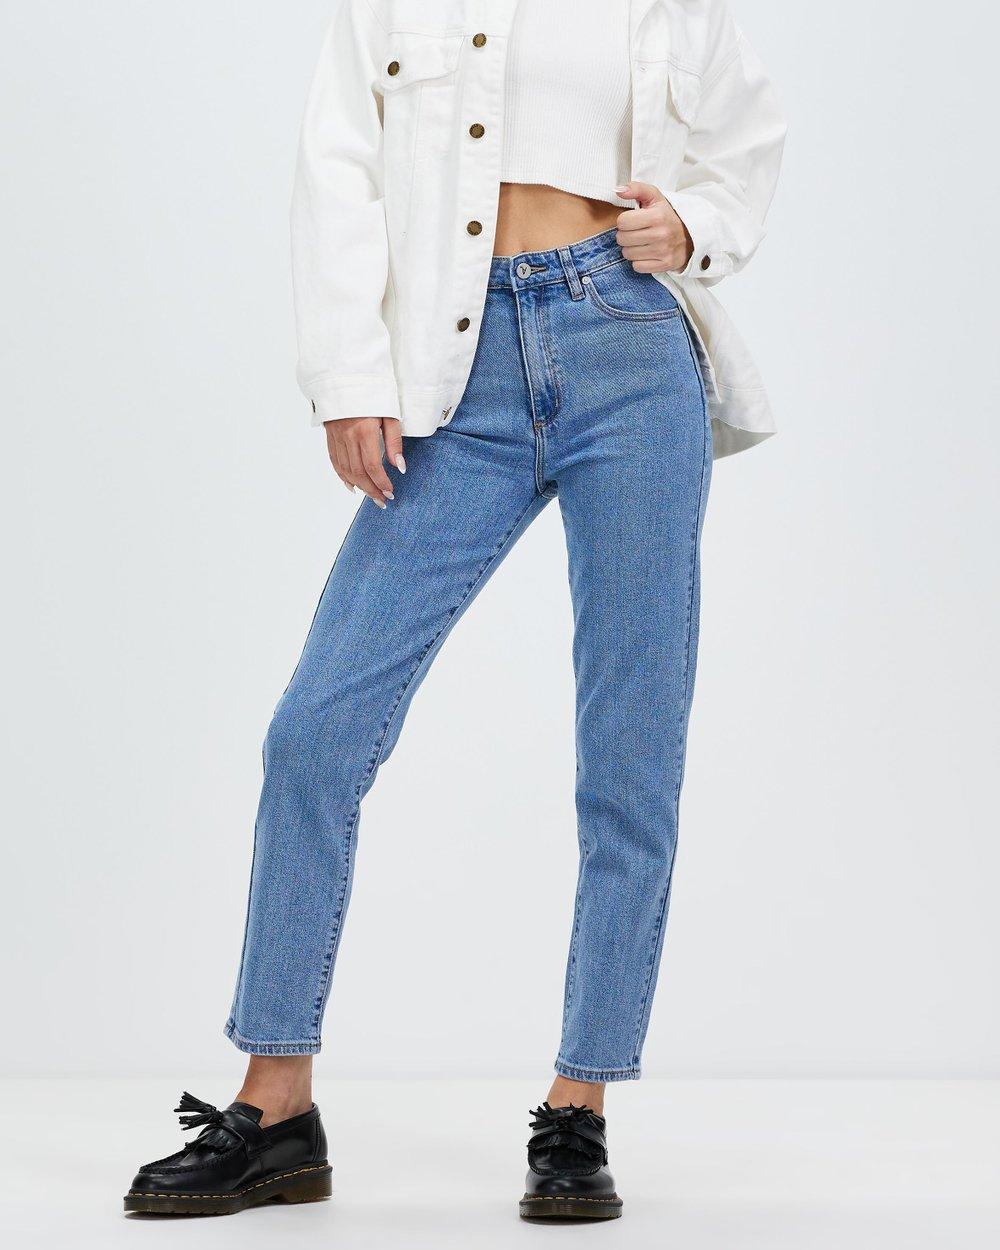 Womens Jeans Skinny High Waisted Ripped Australia The Tendencies Long Pants Rigid Quar Ter Chinos Navy 32 Iconic